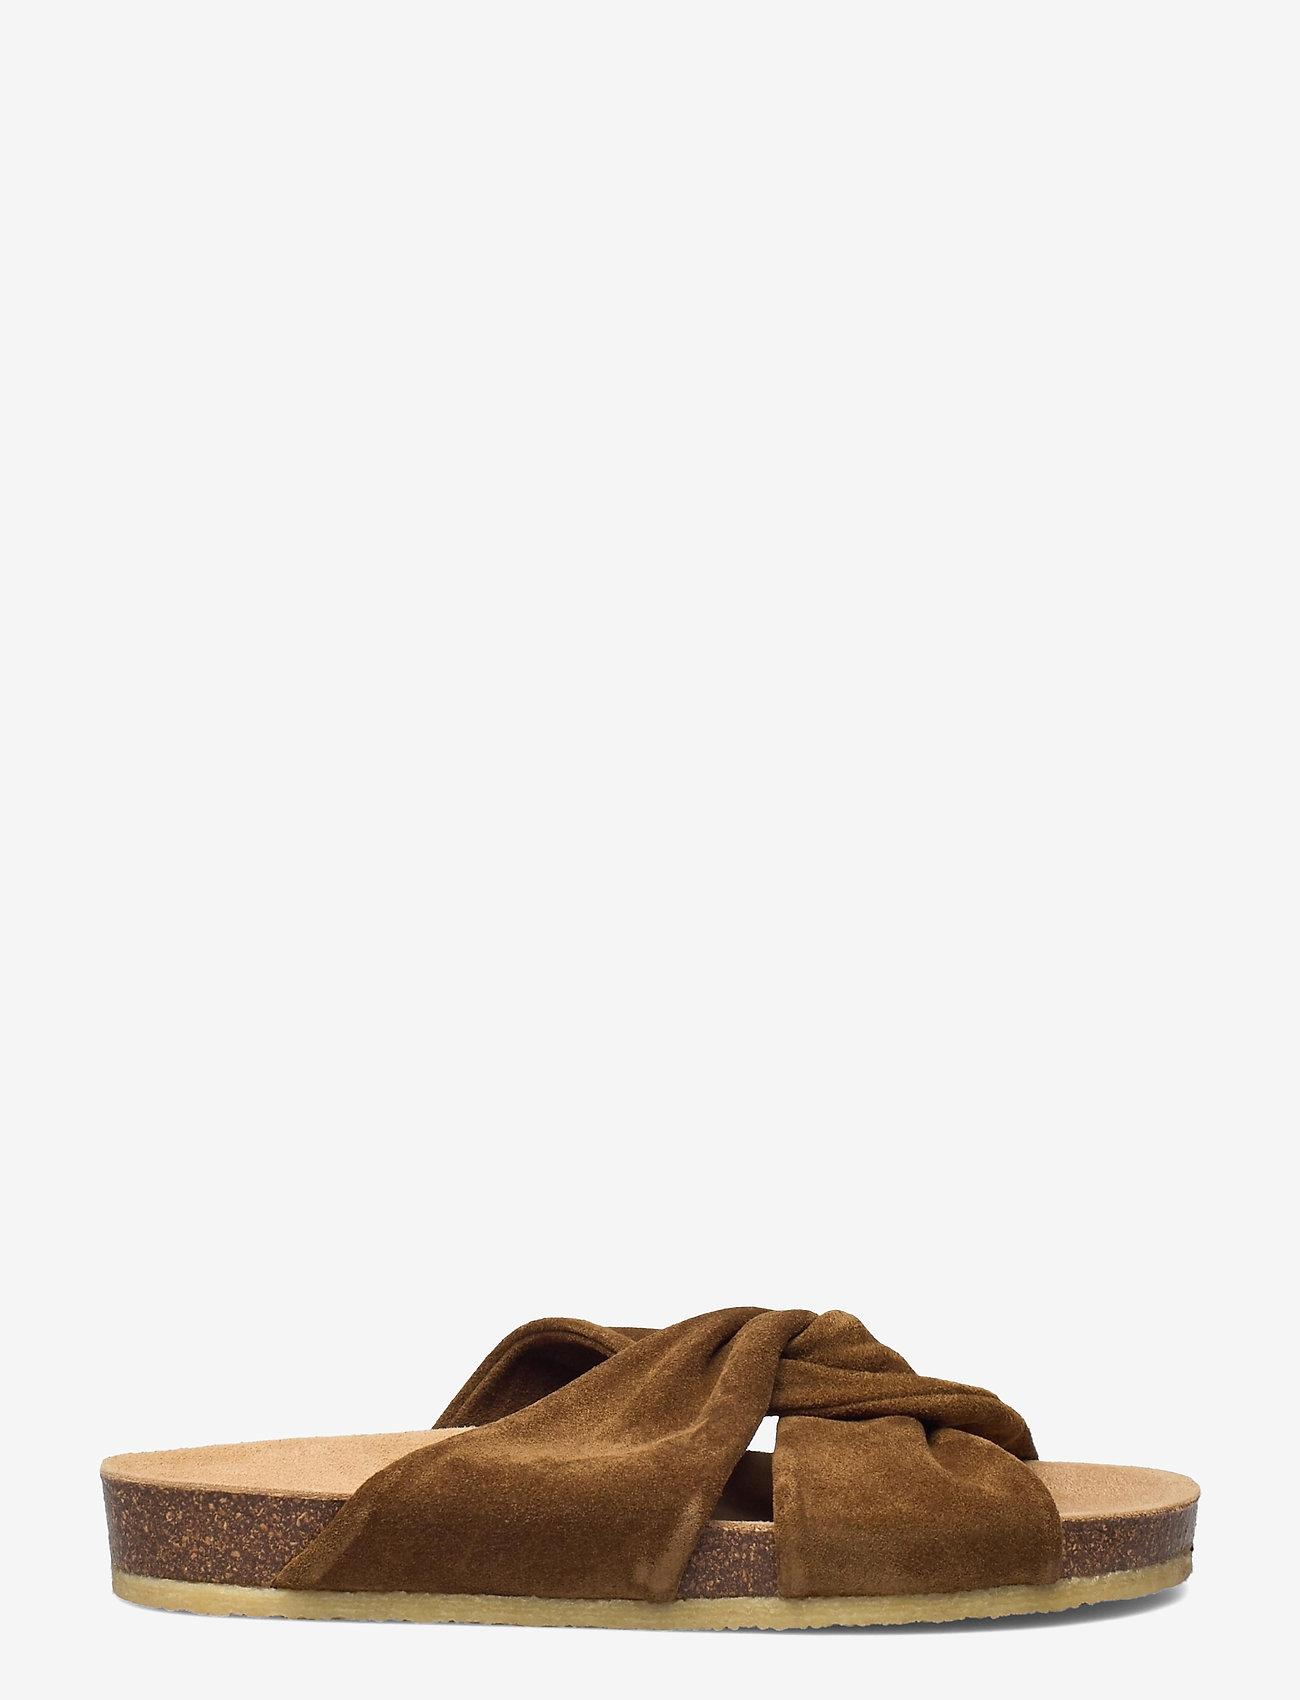 ANGULUS - Sandals - flat - open toe - op - flache sandalen - 2209 mustard - 1